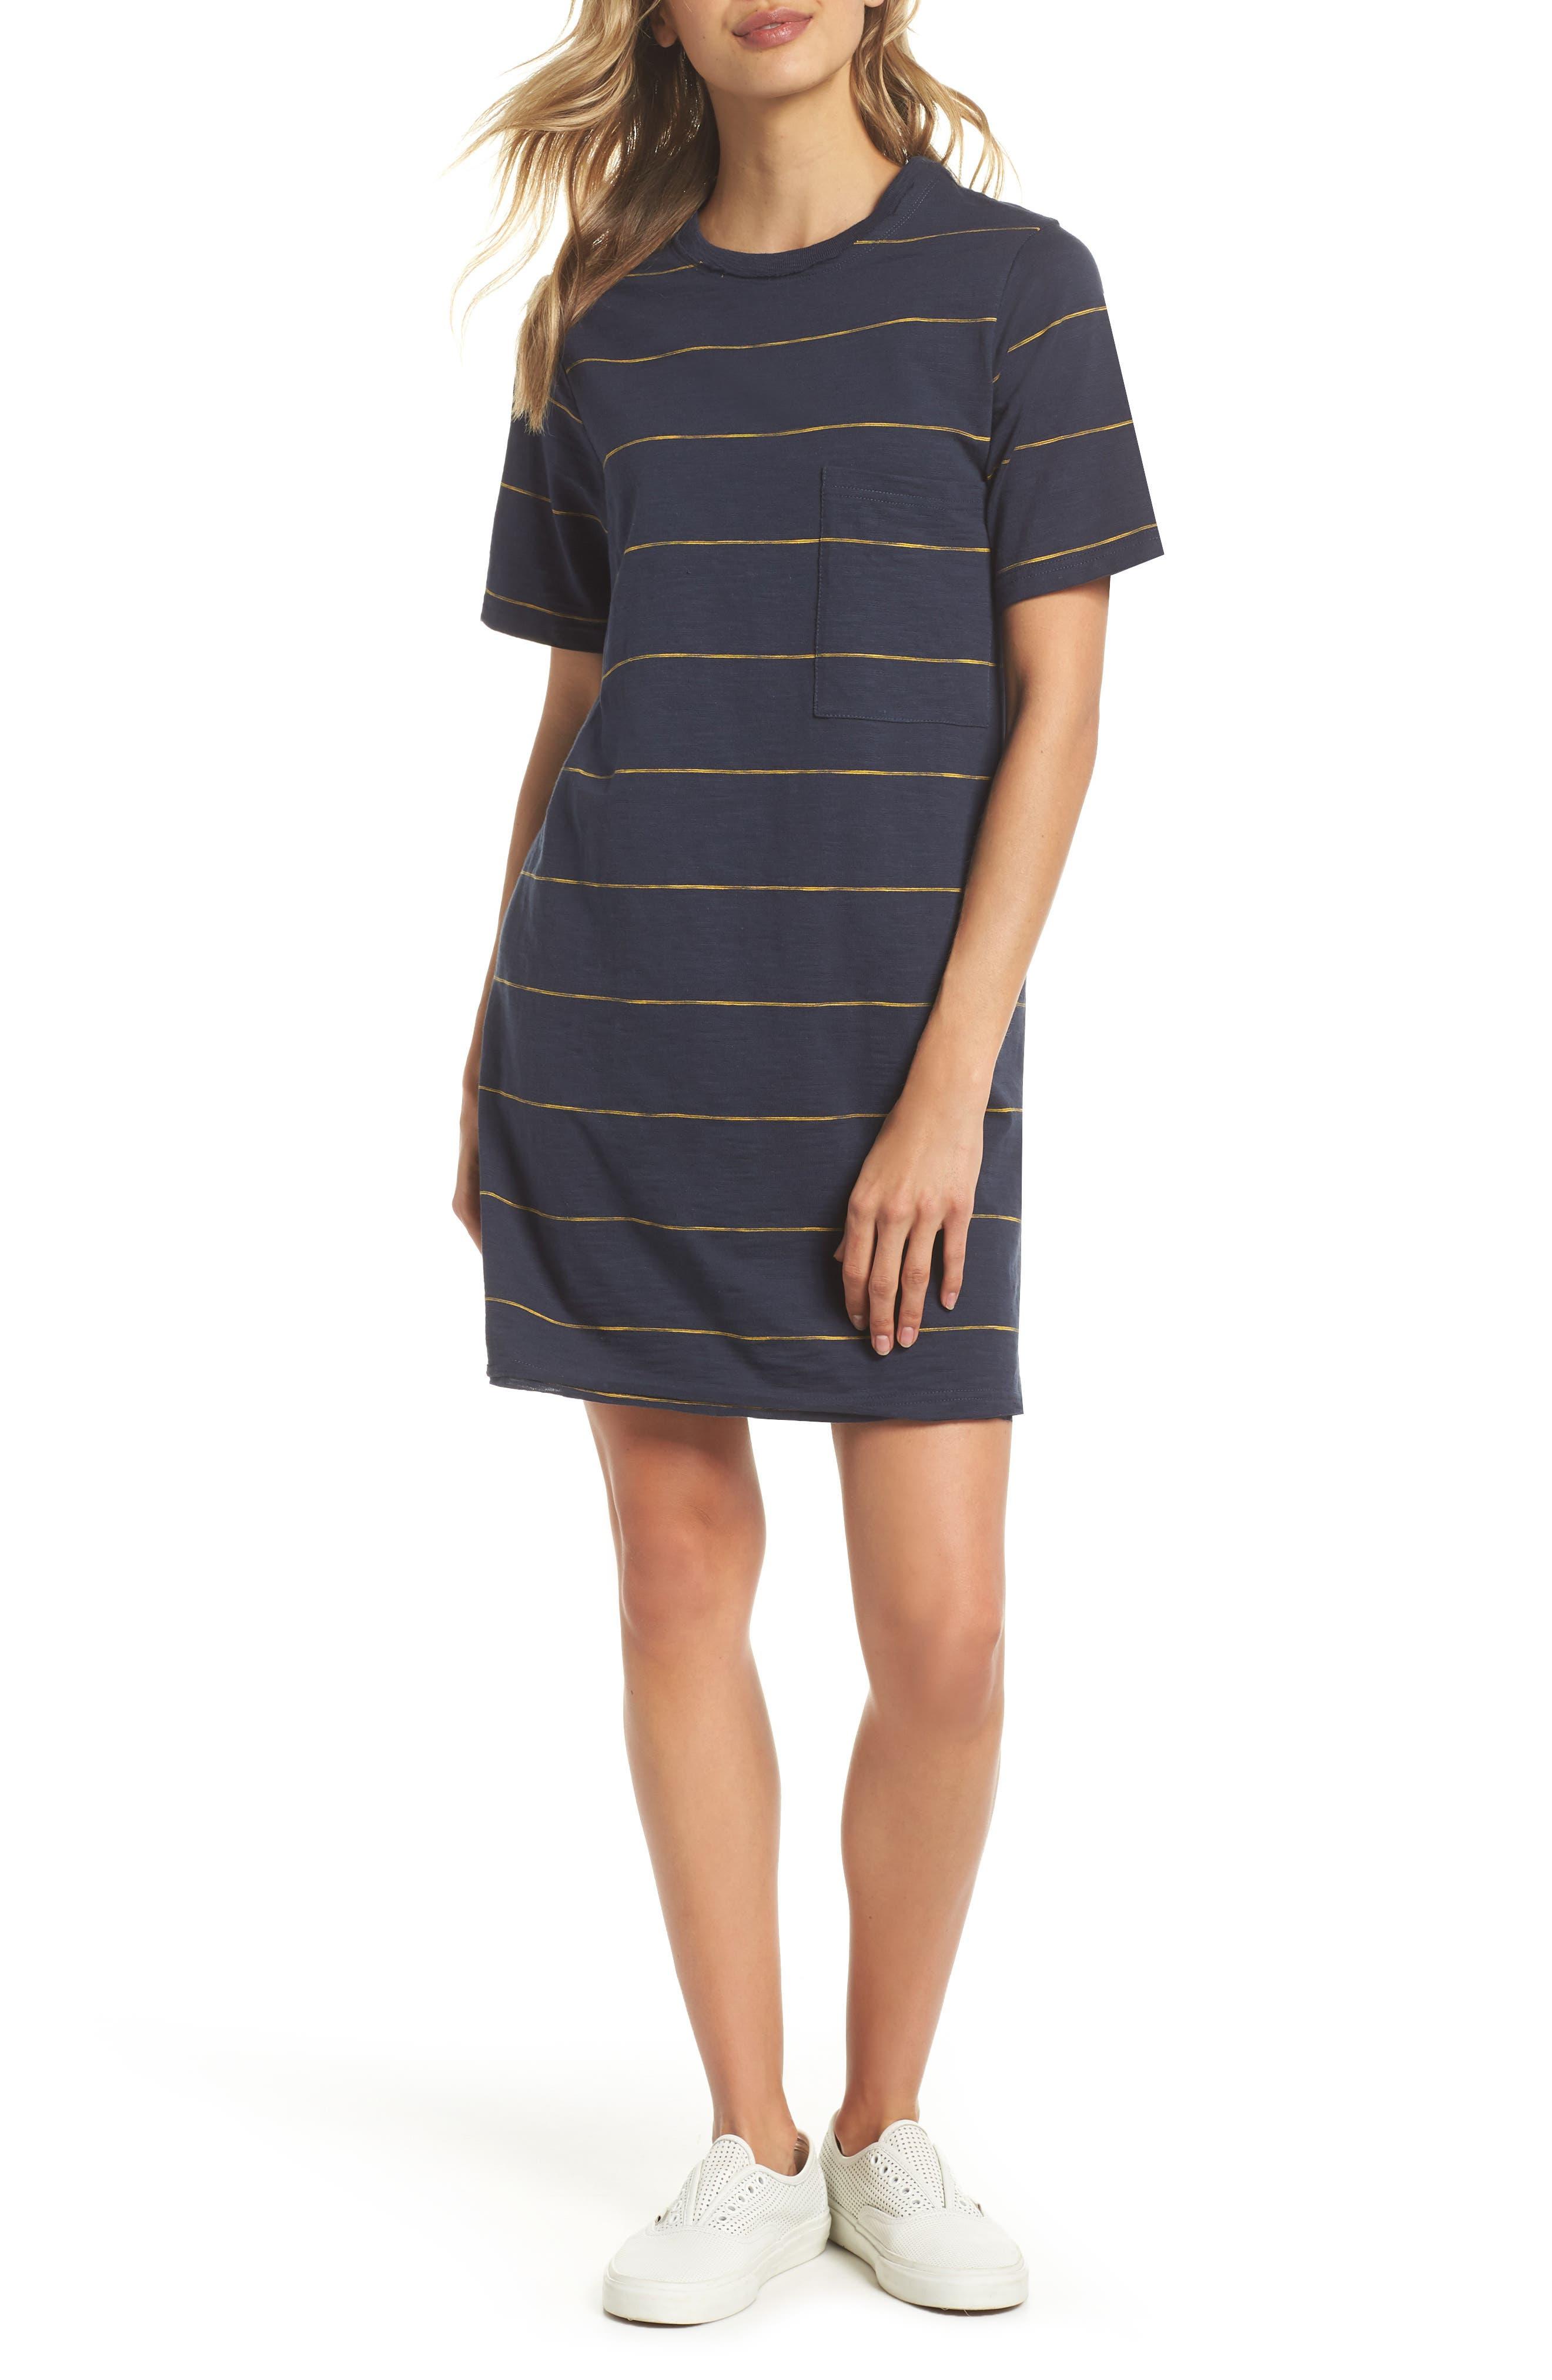 Alternate Image 1 Selected - Knot Sisters Sunset Stripe T-Shirt Dress